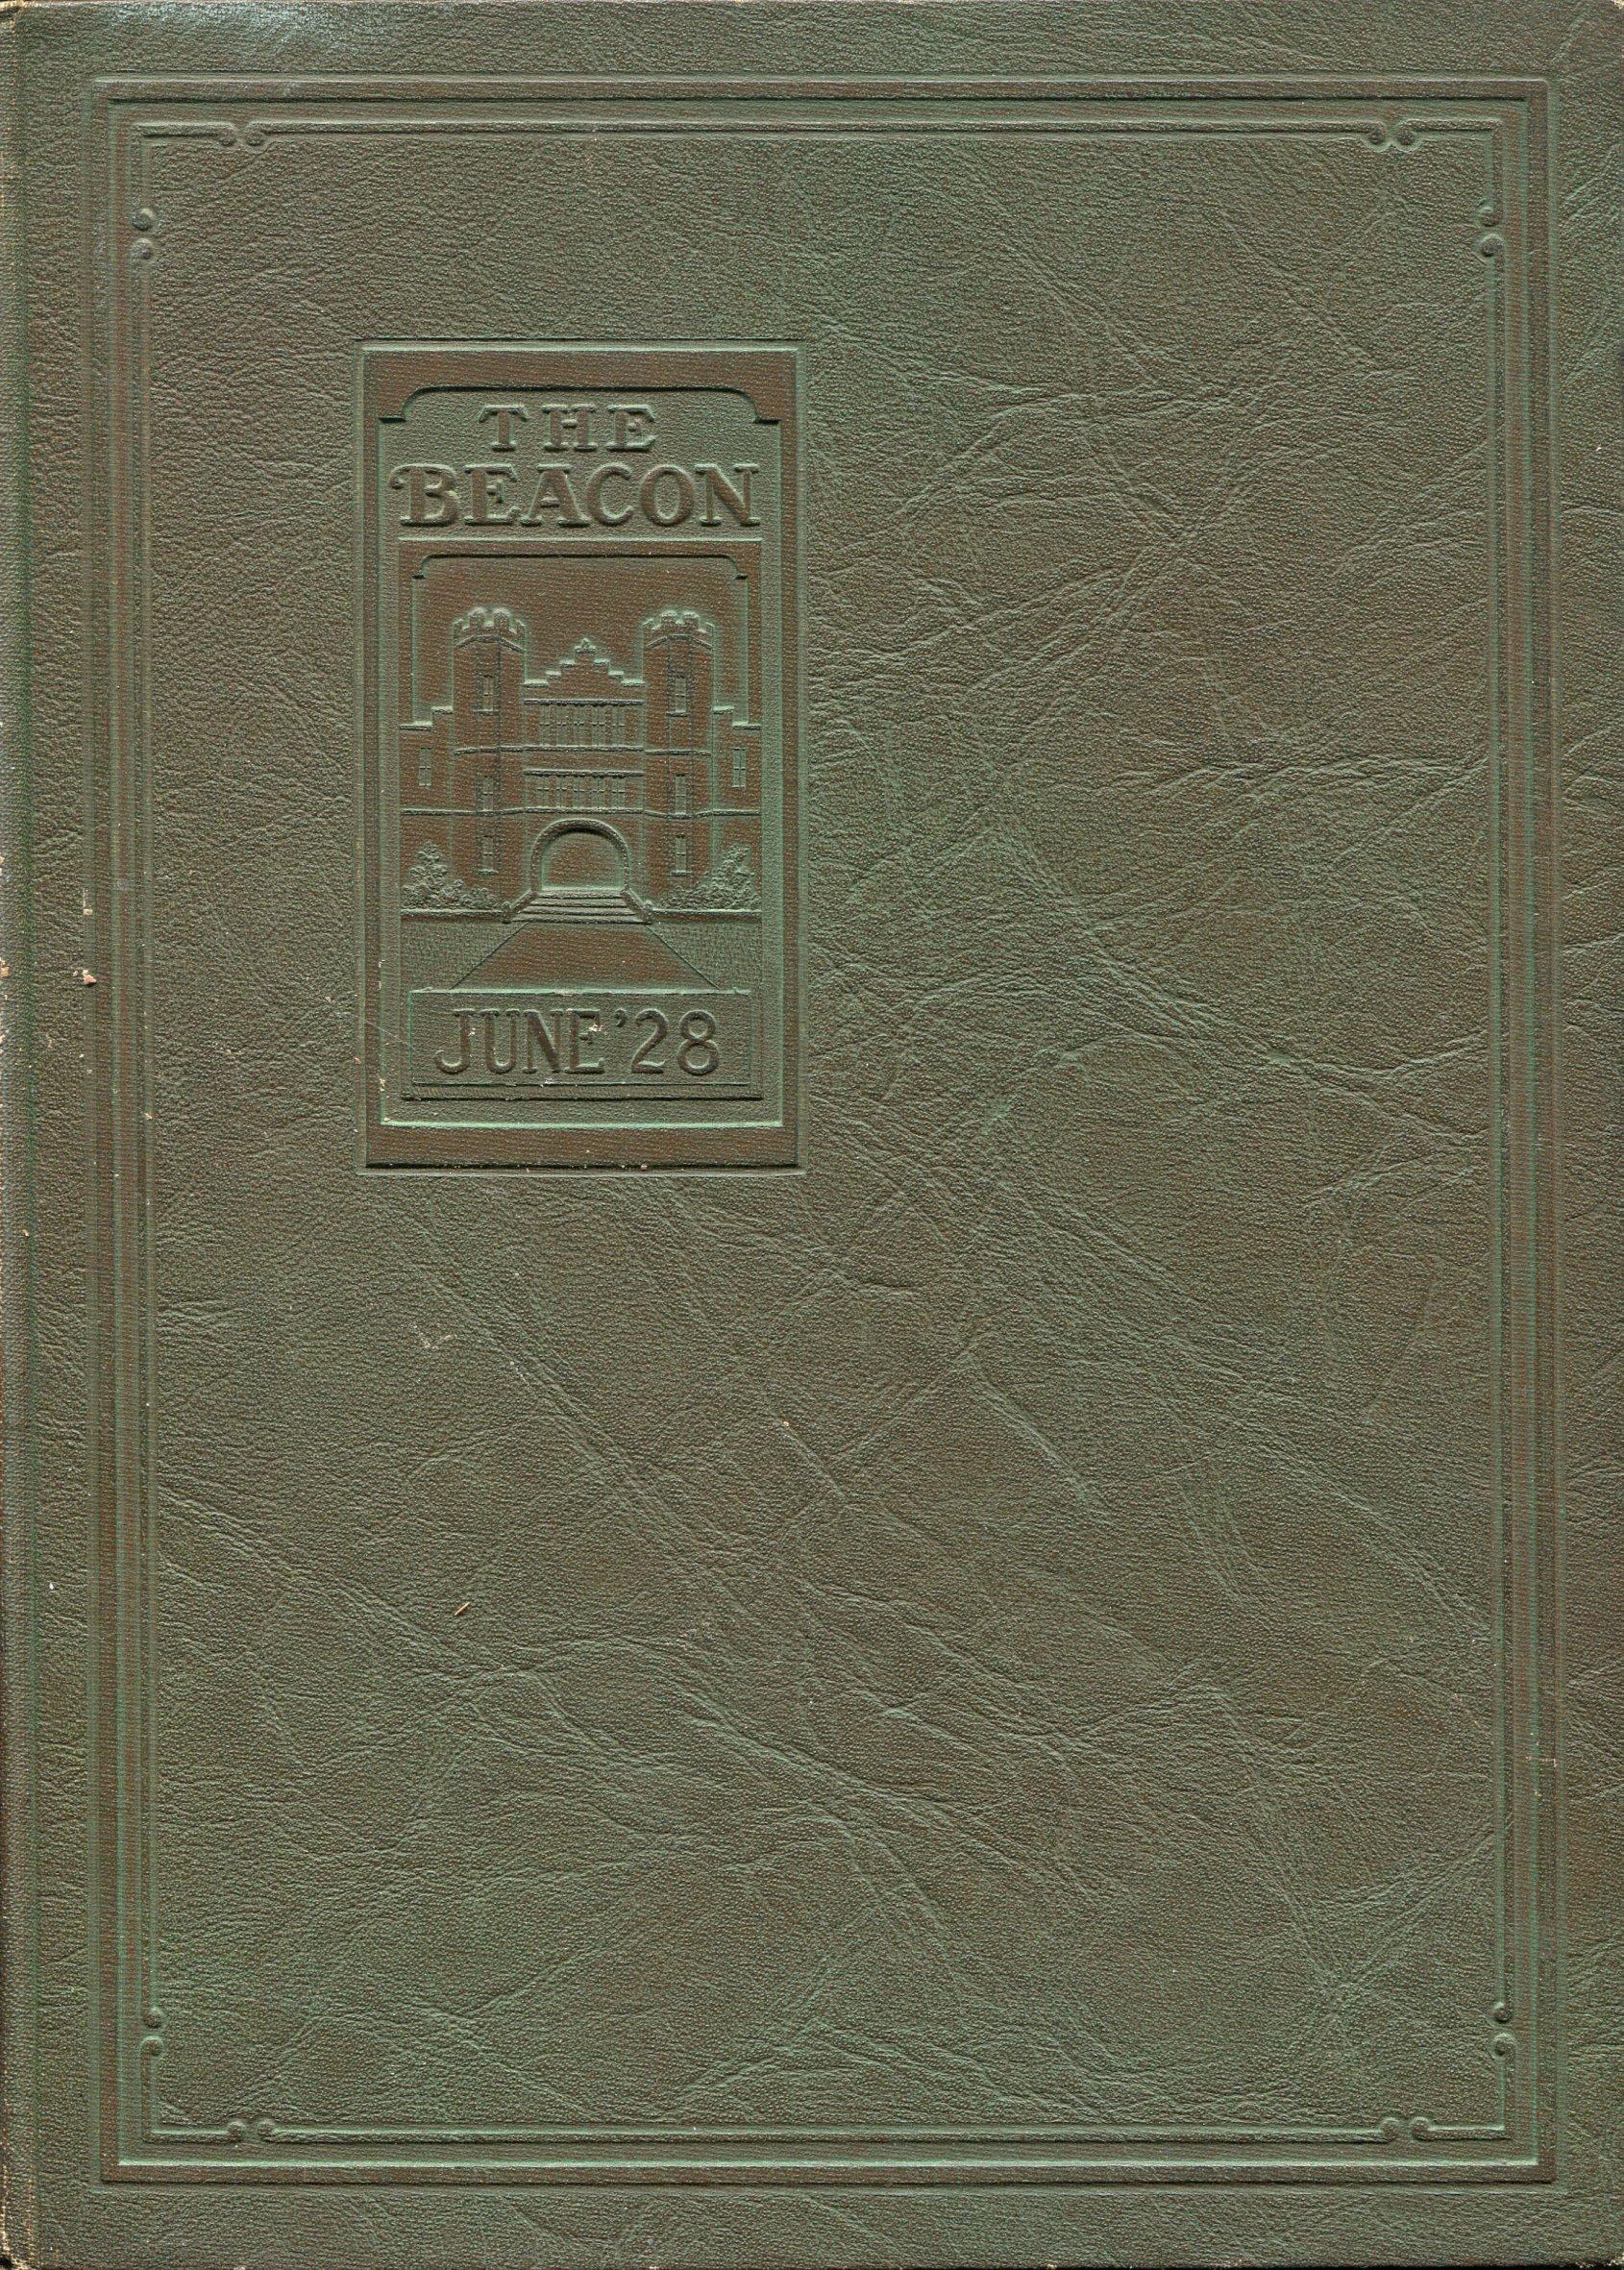 Grover Cleveland High School St Louis Missouri Yearbook